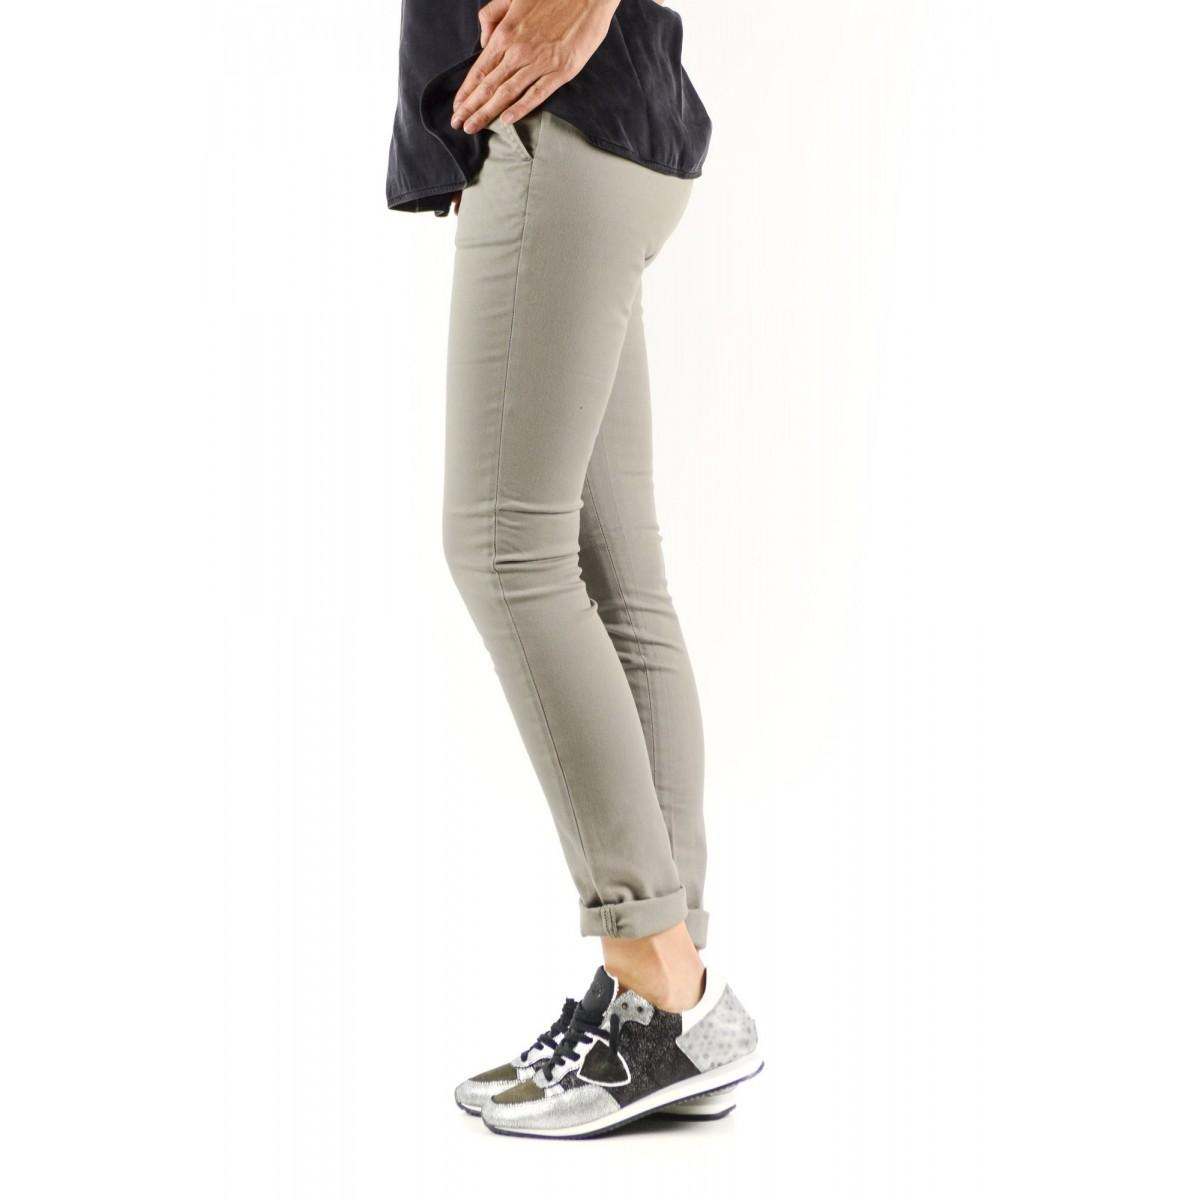 Trousers Ralph Lauren Woman - V44Iobokt5212